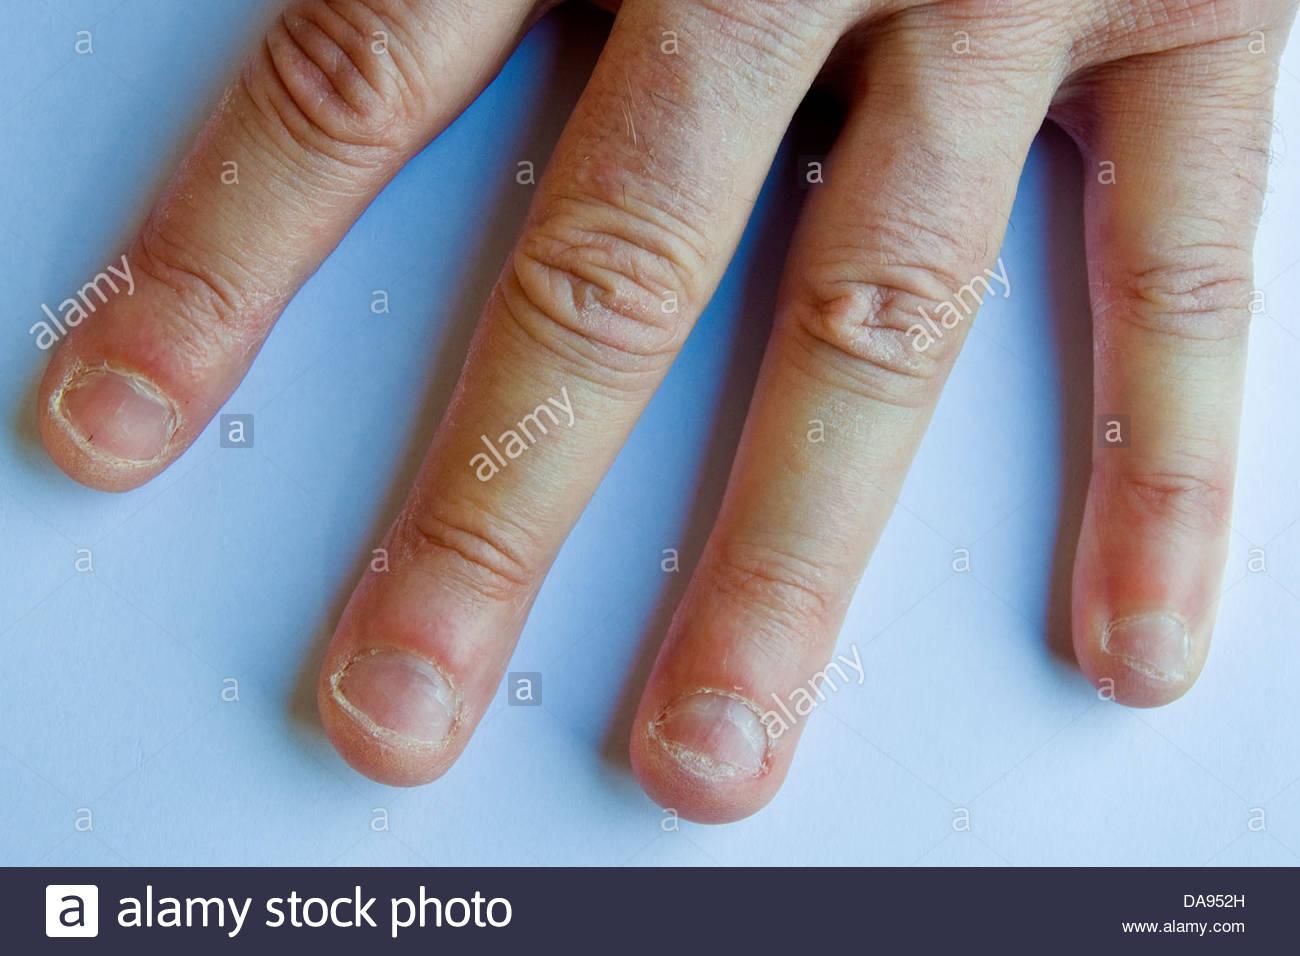 Bitten Nails Stock Photos & Bitten Nails Stock Images - Alamy